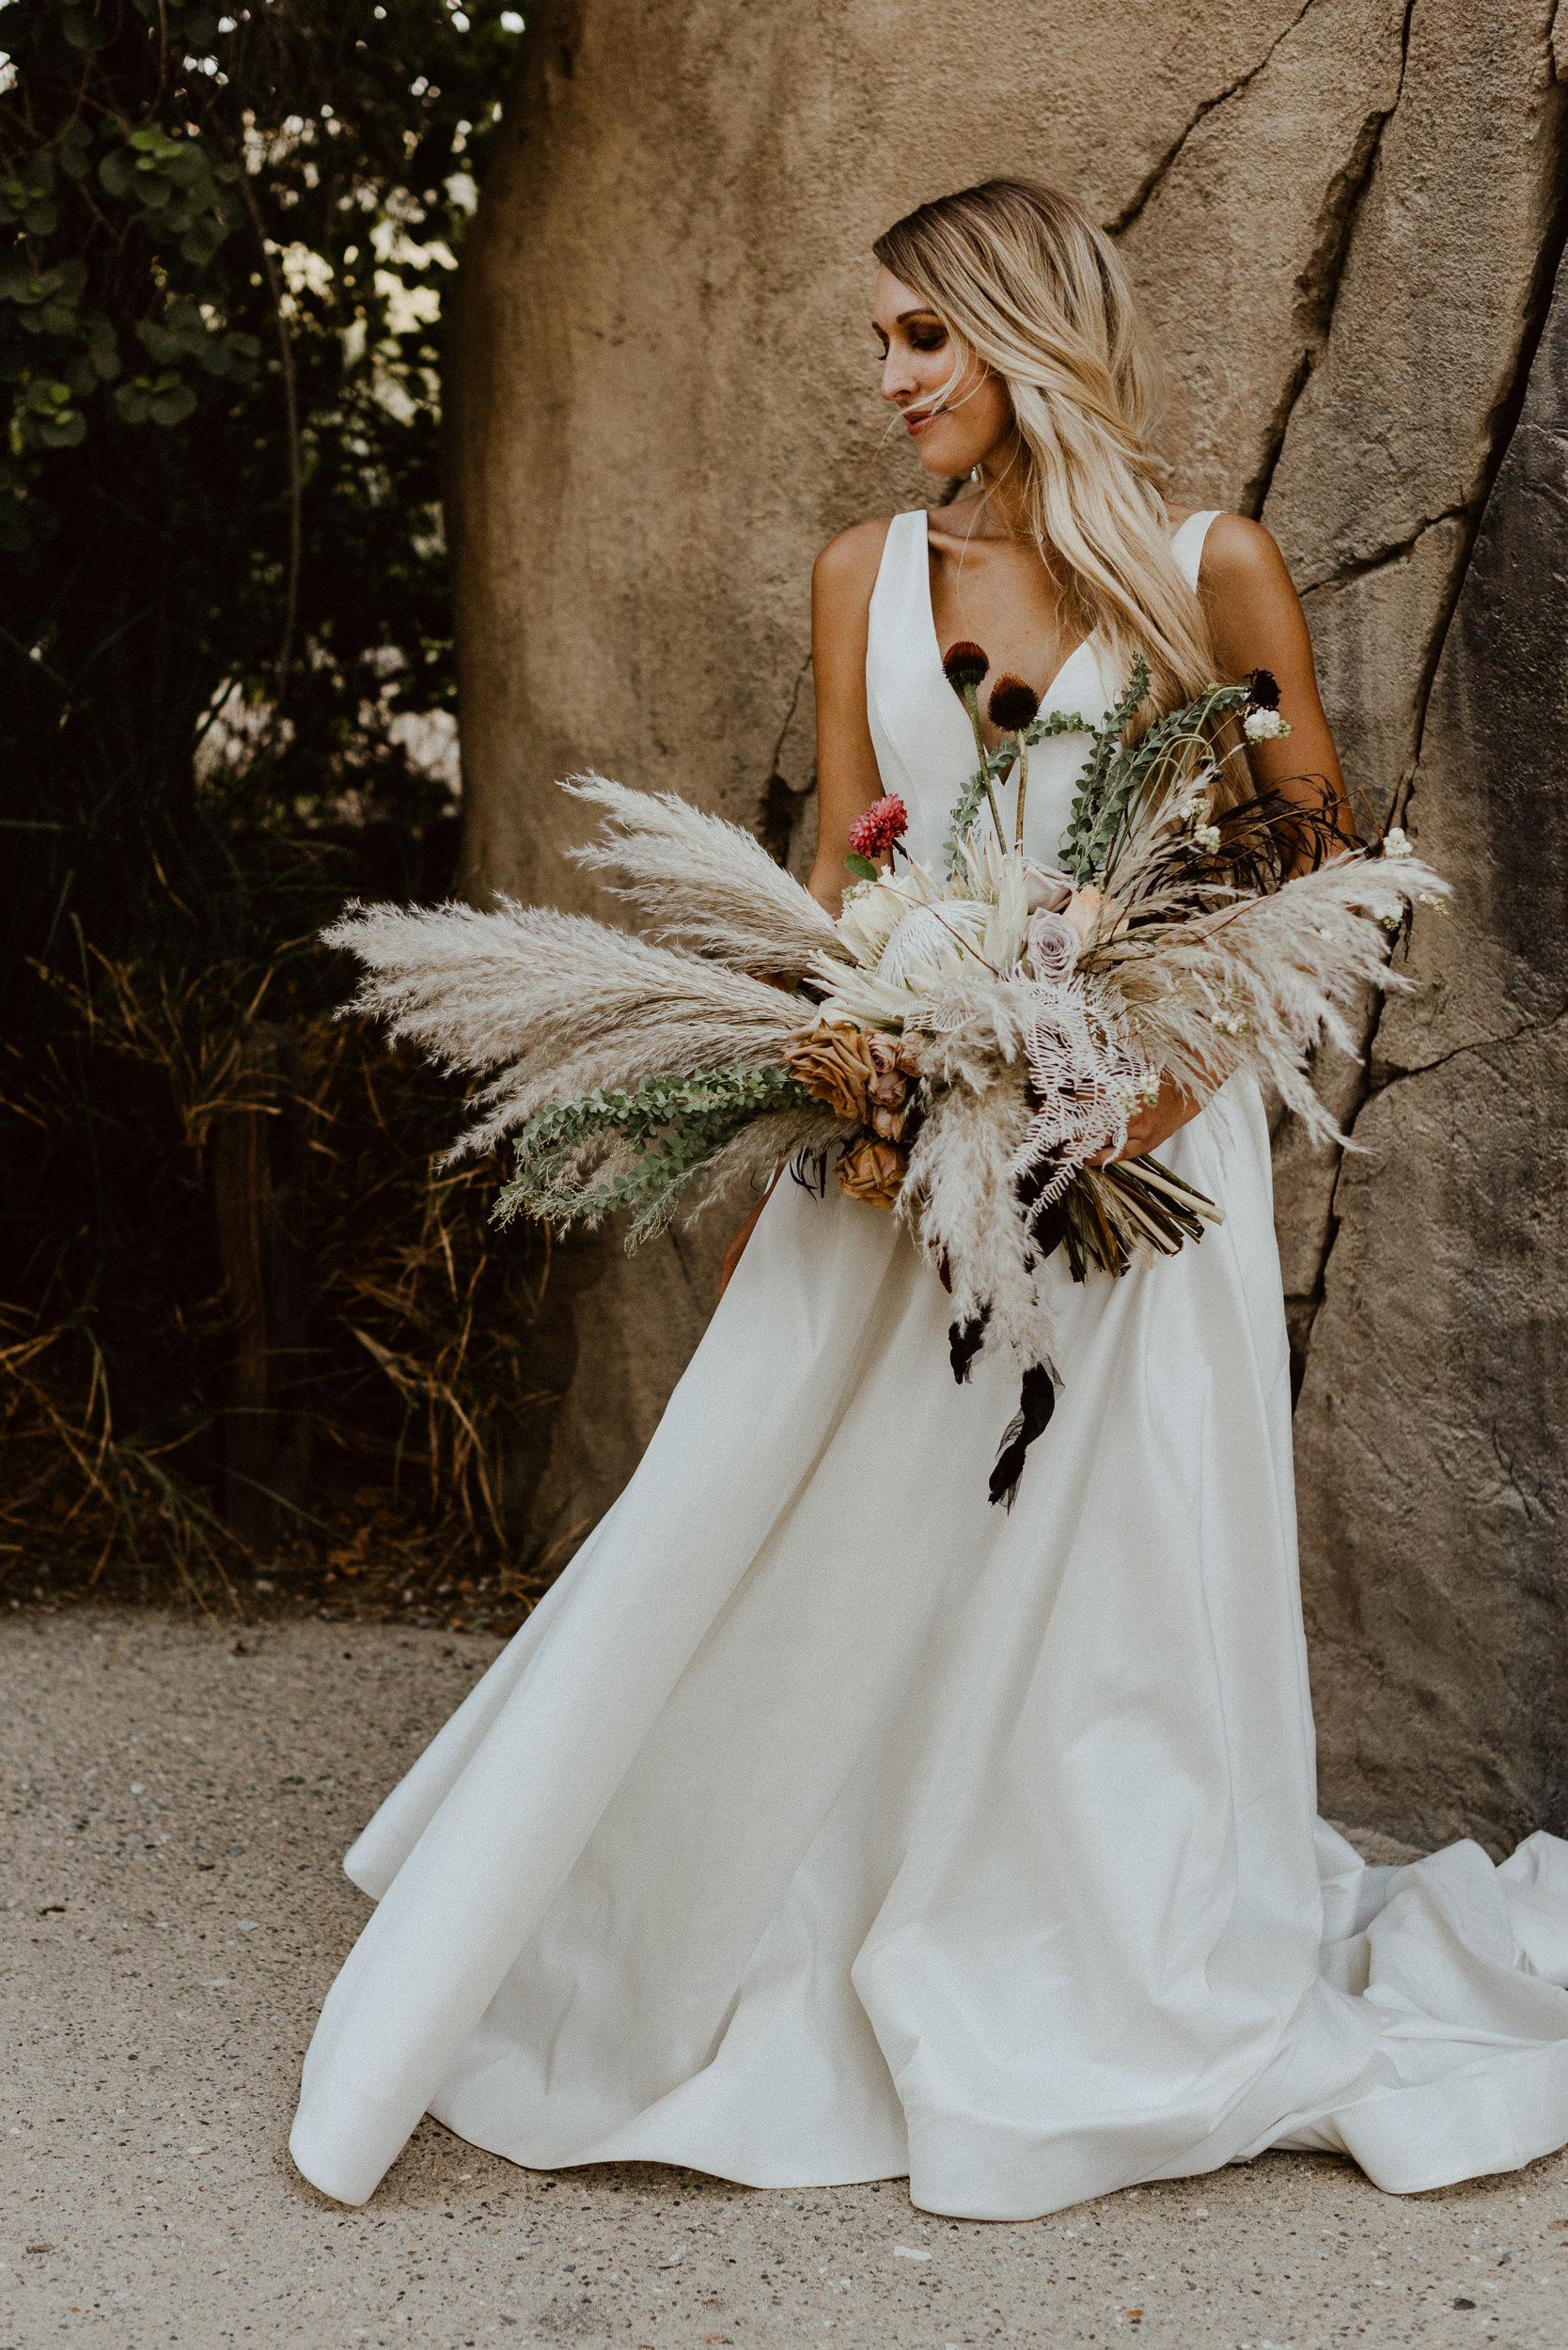 sChelsie + Chris - The Desert Shootout Wedding Romantics at The Living Desert-106.jpg